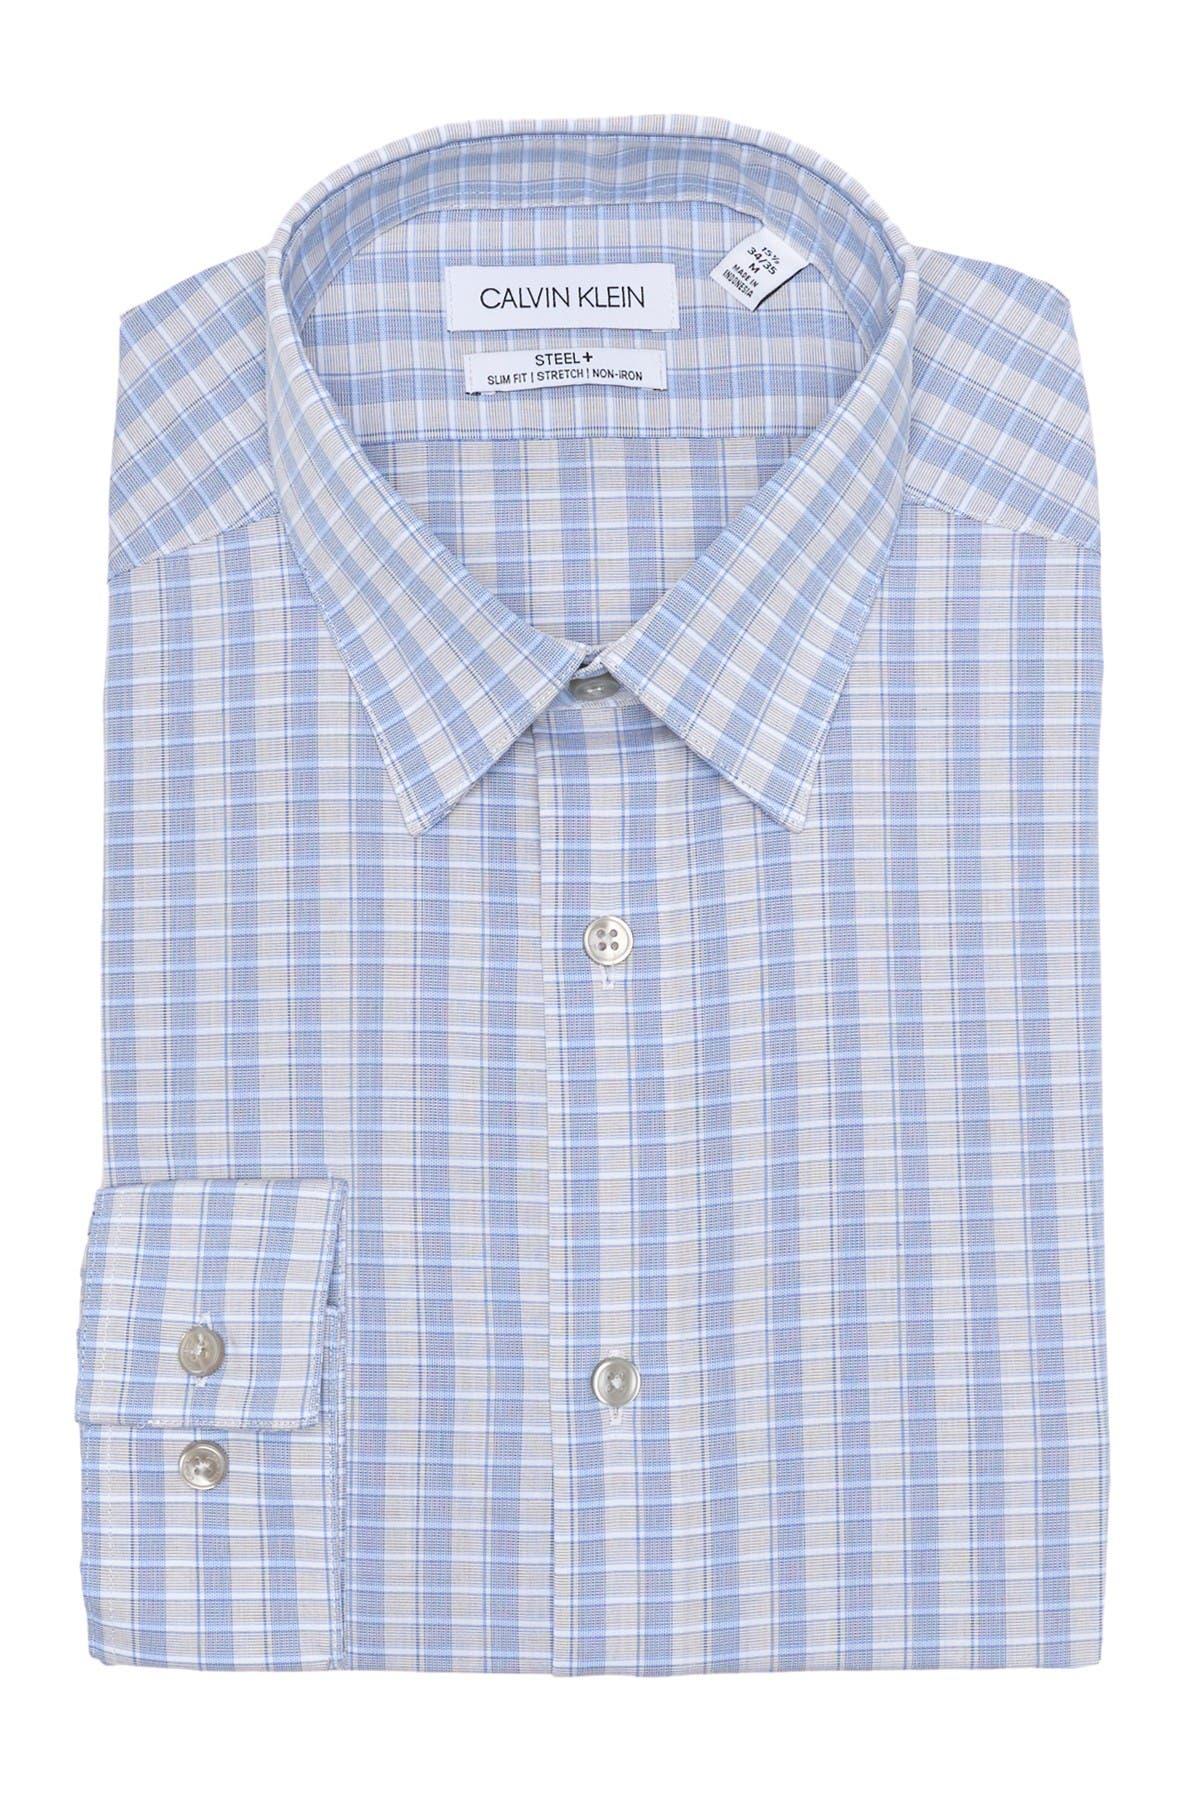 Image of Calvin Klein Plaid Print Slim Fit Dress Shirt